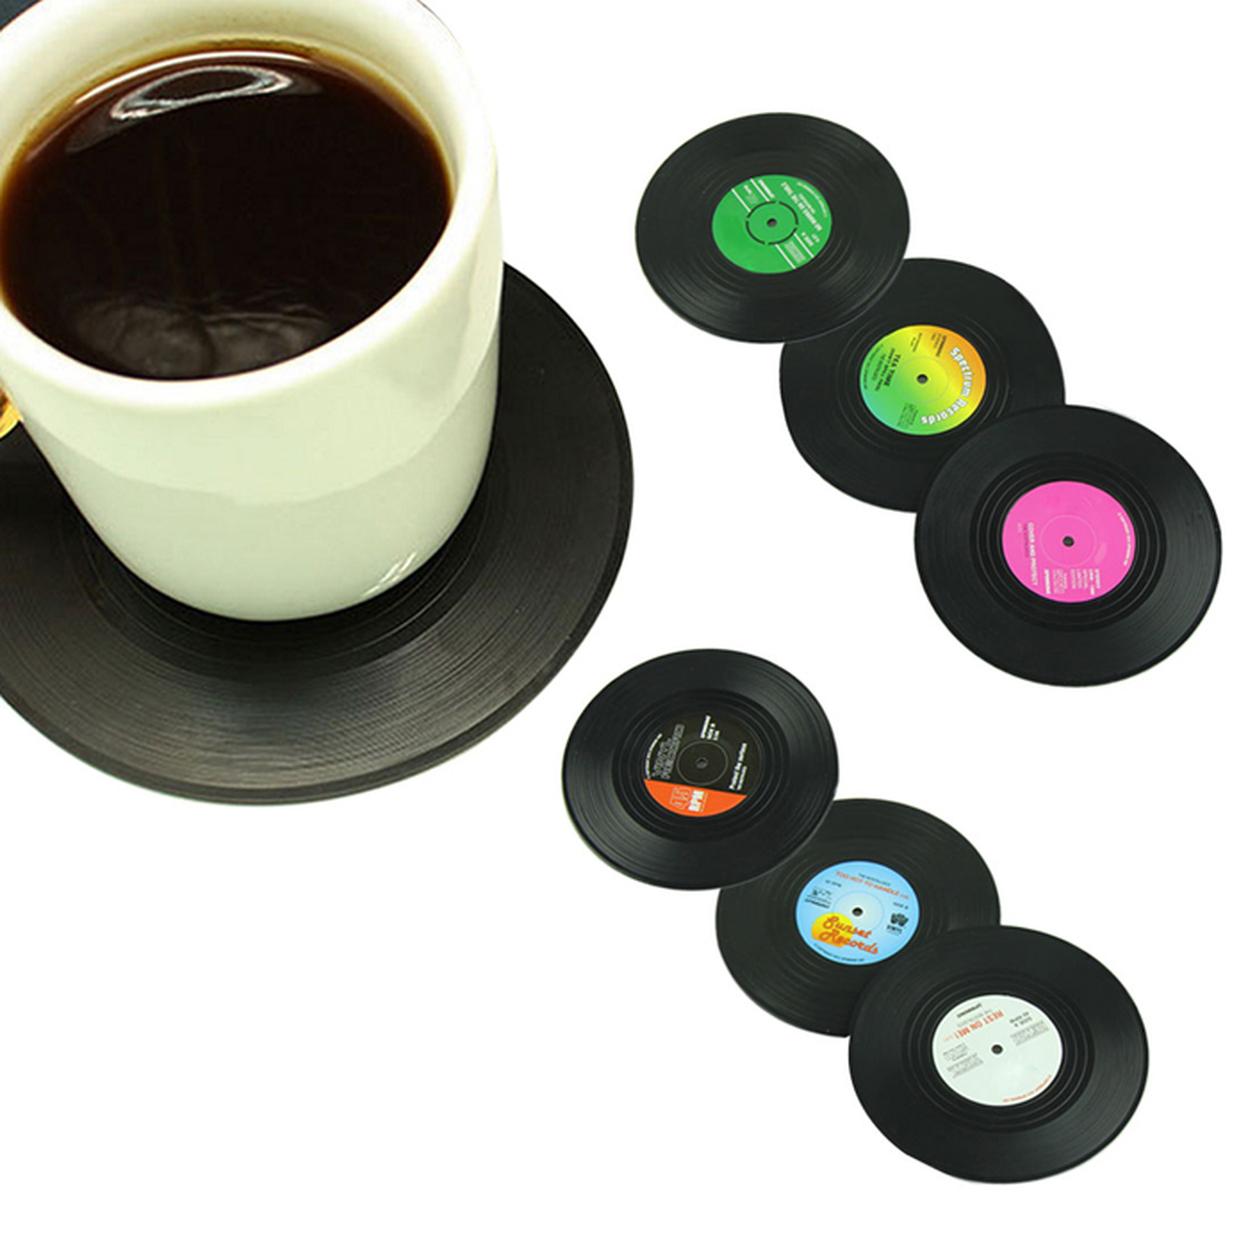 6pcs/set Spinning Retro Vinyl CD Record Drinks Coasters Anti-slip Cup Coffee Mug Mat 59eb00fccaccdd43b4535525